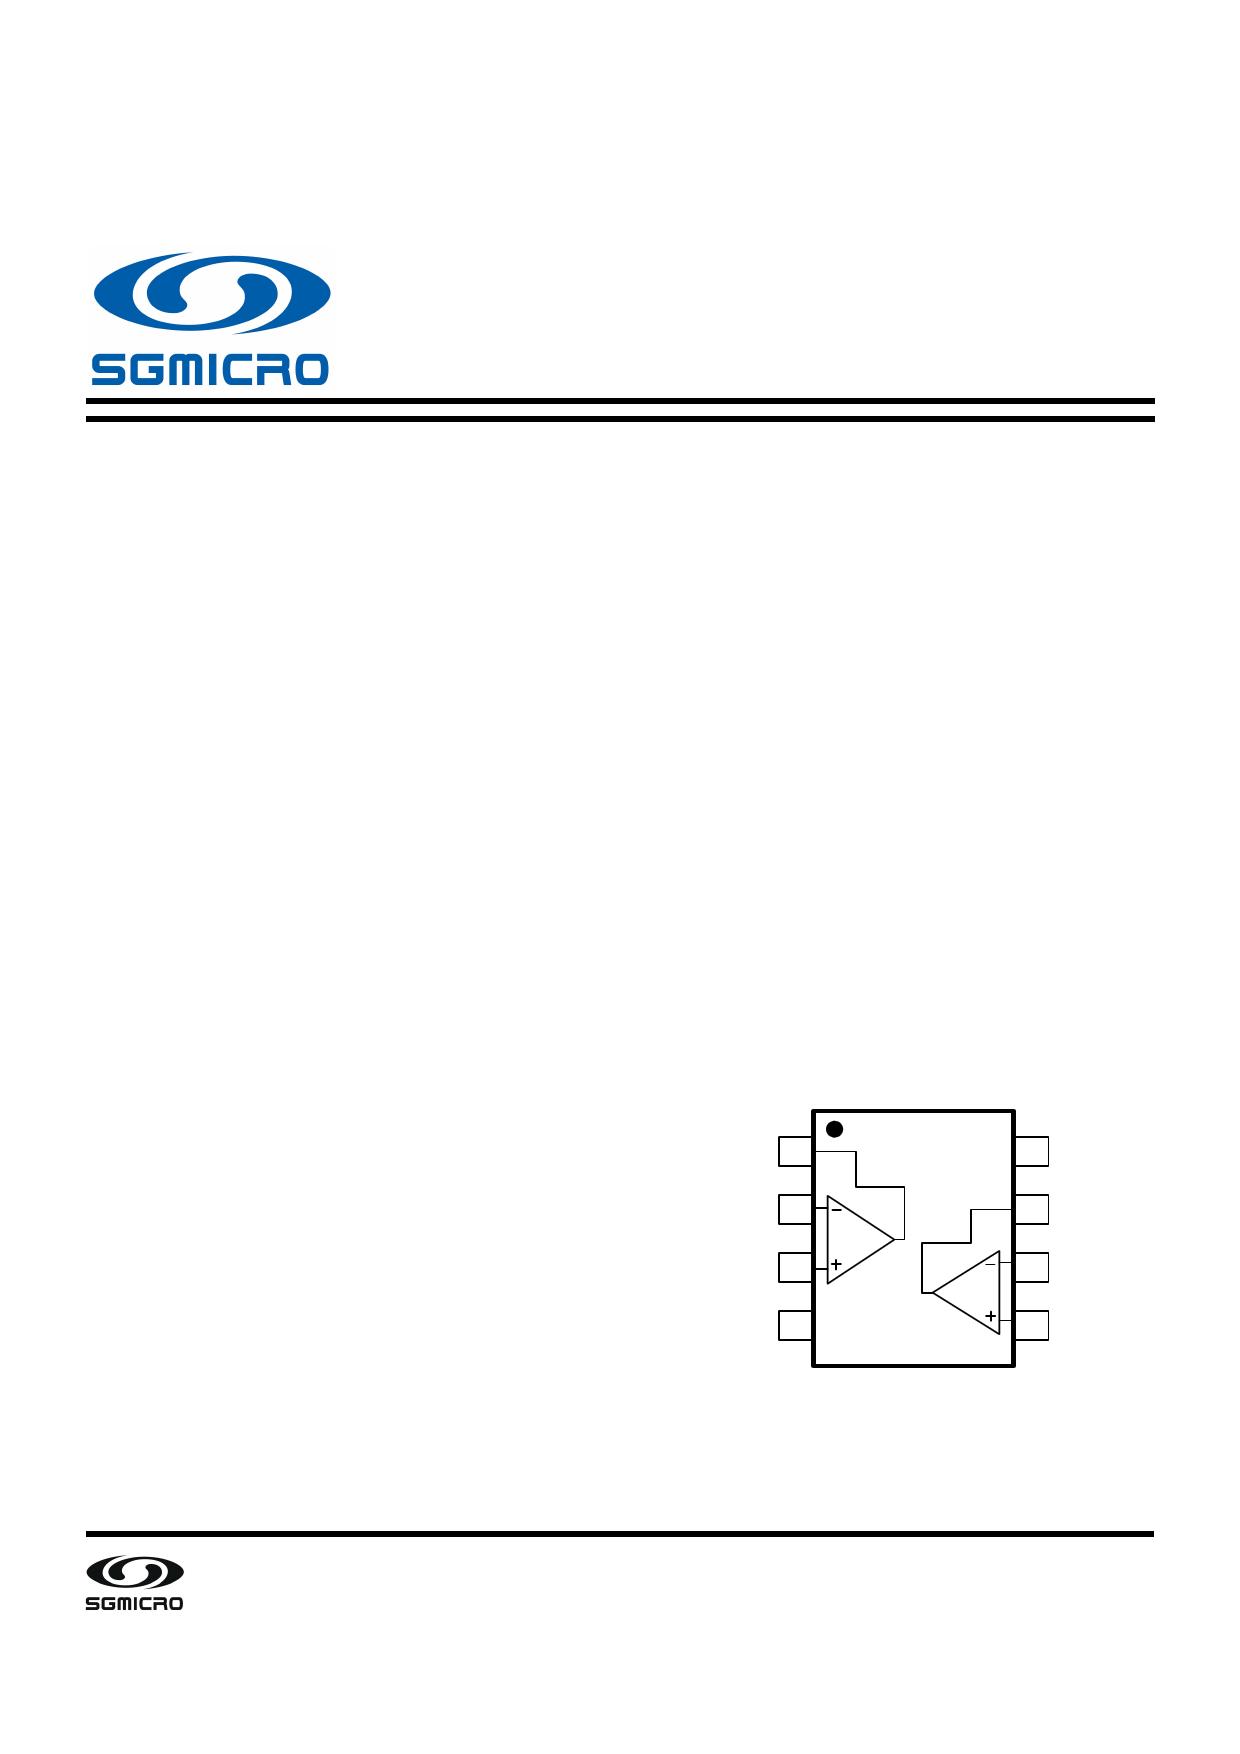 SGM8582 datasheet, circuit